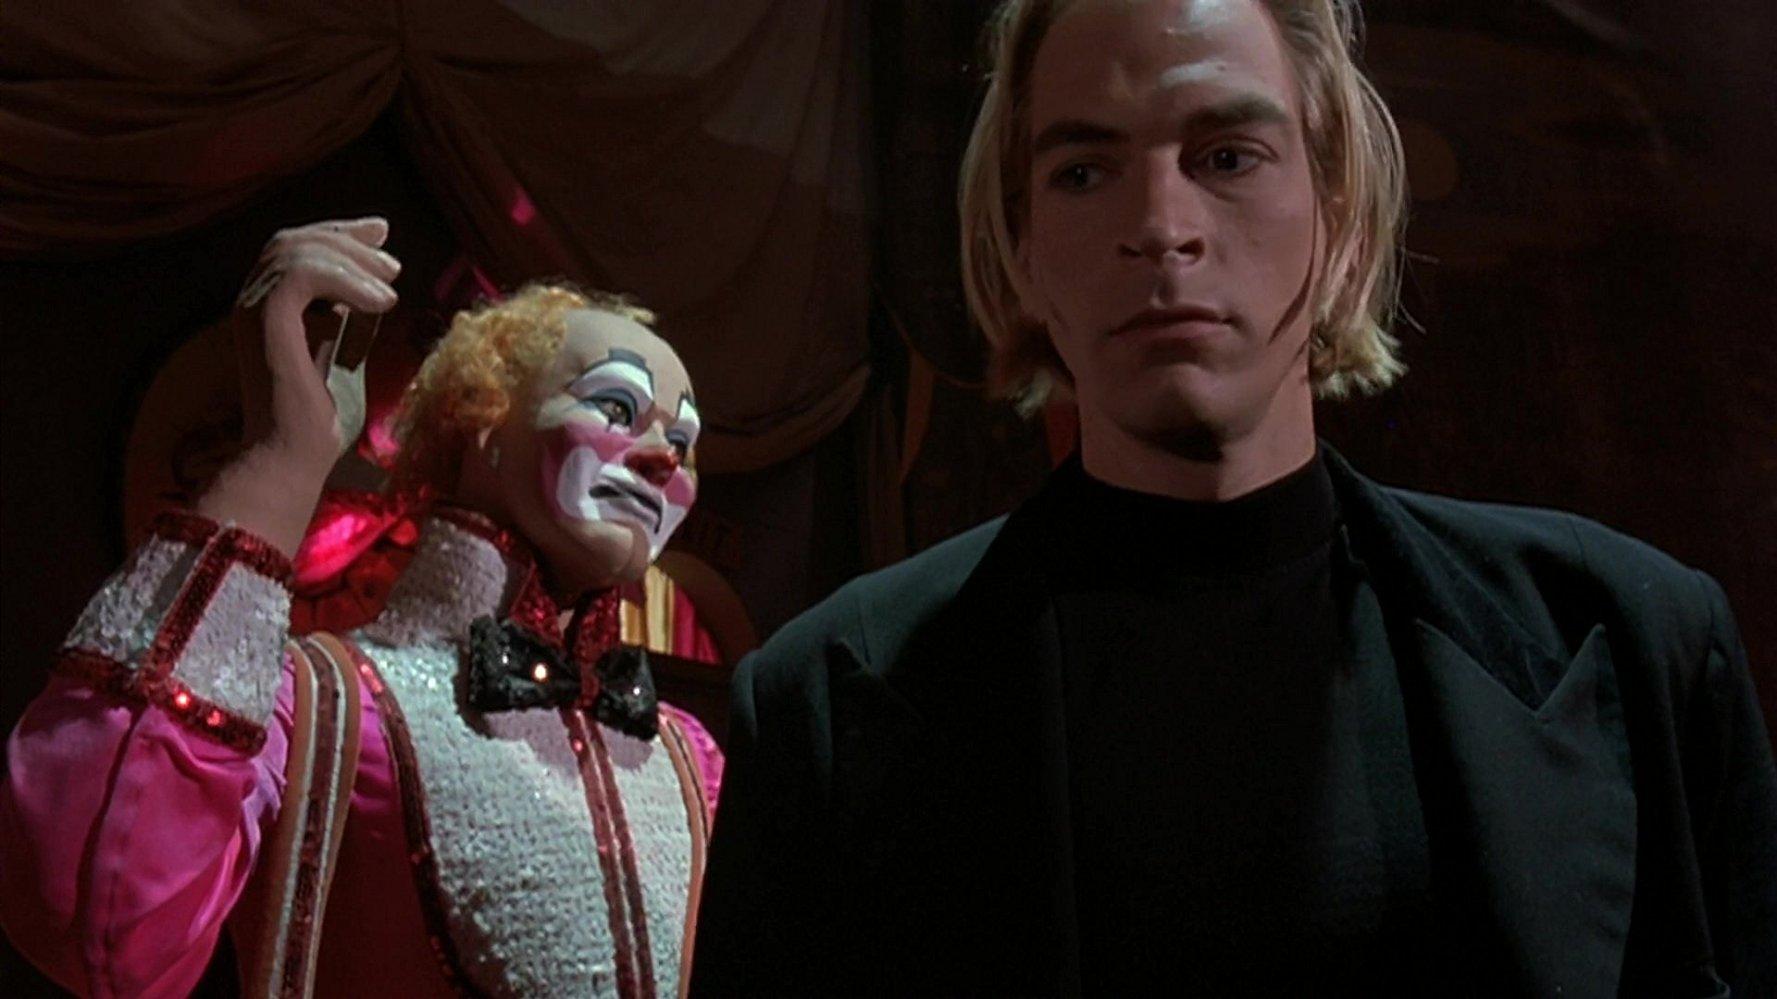 Warlock 2 - The Armageddon (1993)